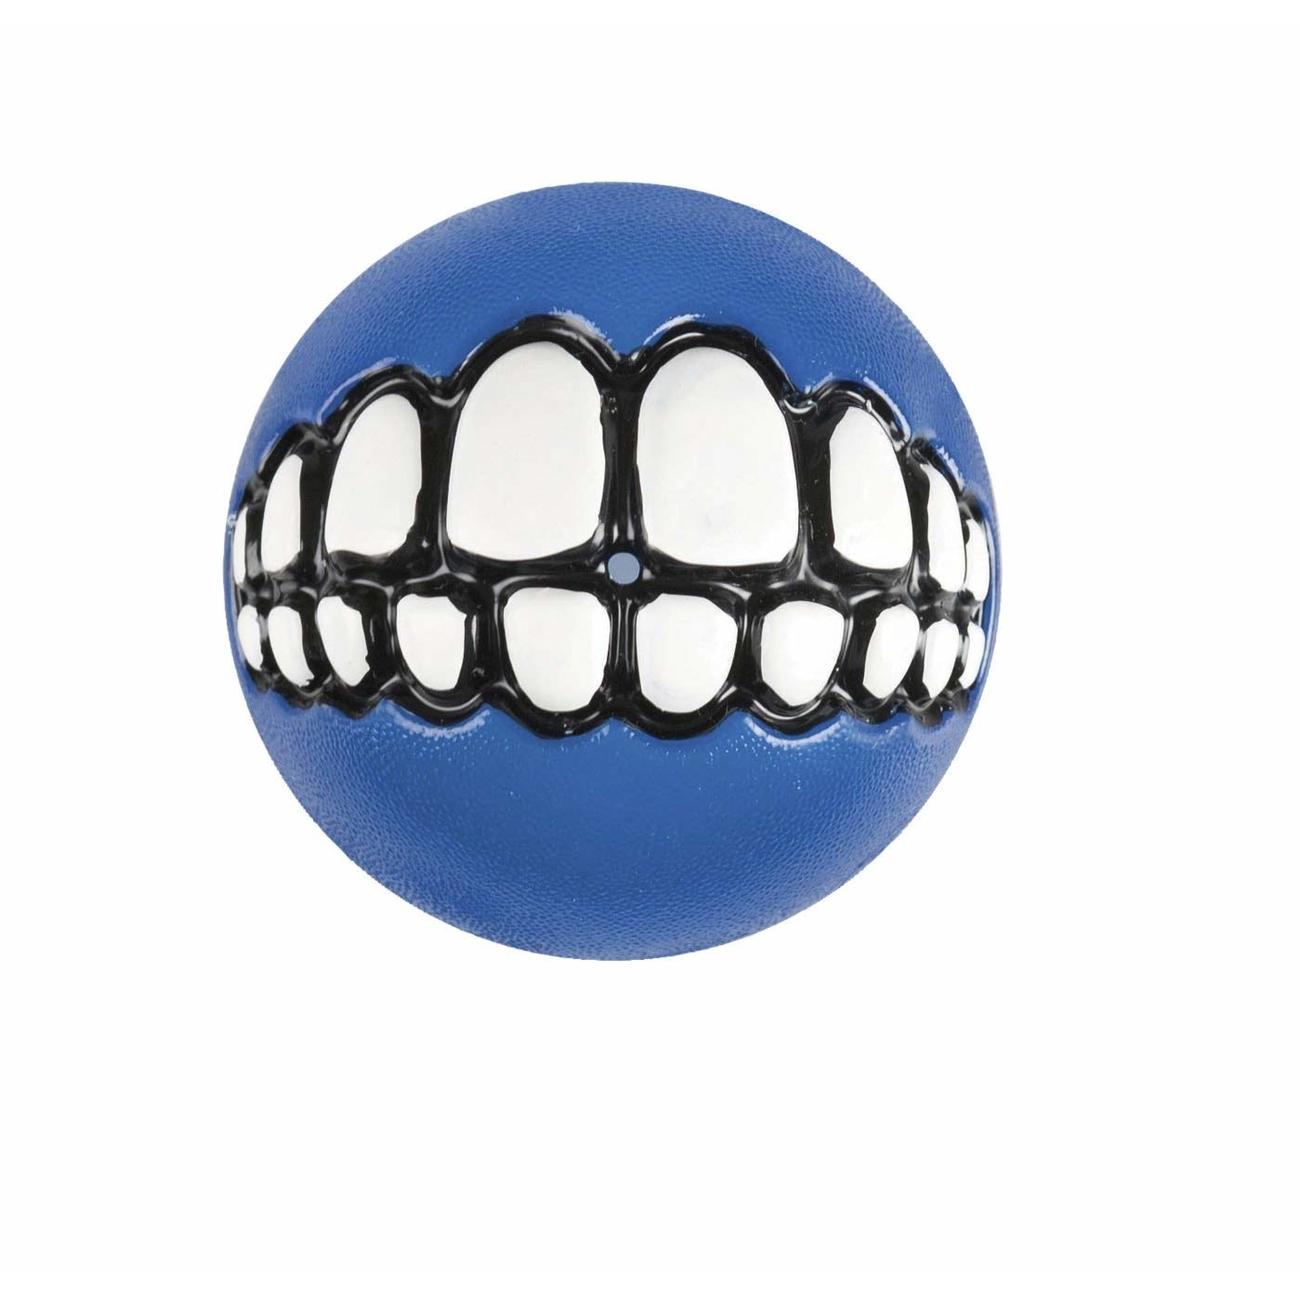 Rogz ROGZ Grinz Ball für Hunde, Bild 7